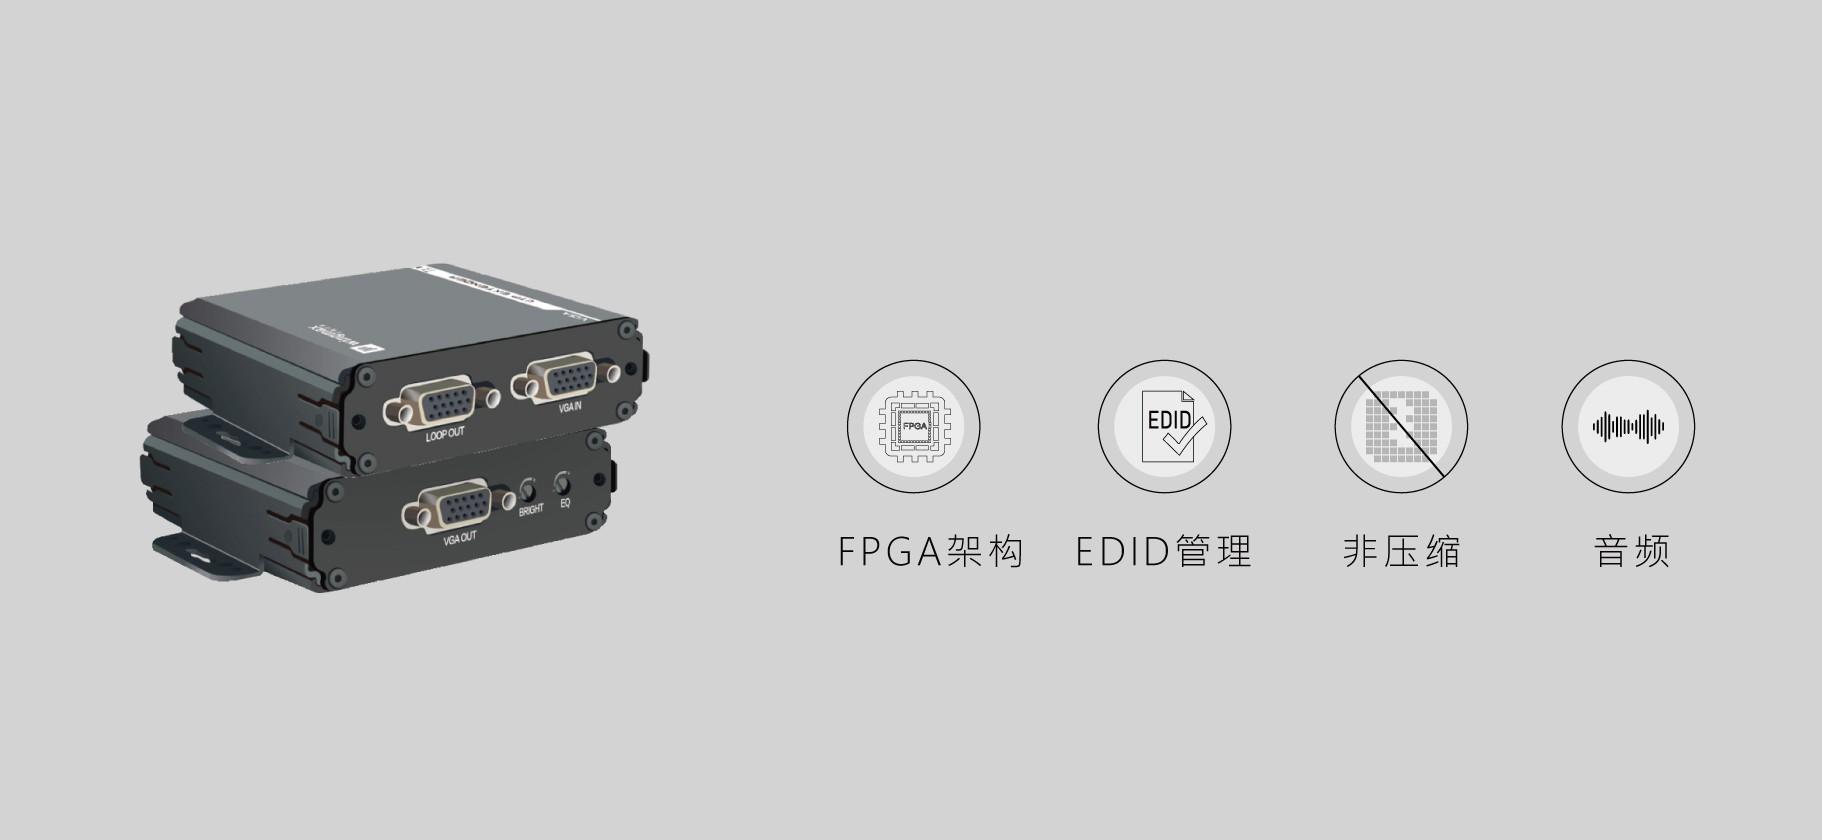 VGA双绞线传输器 本地环出 | 图像补偿 | 支持音频